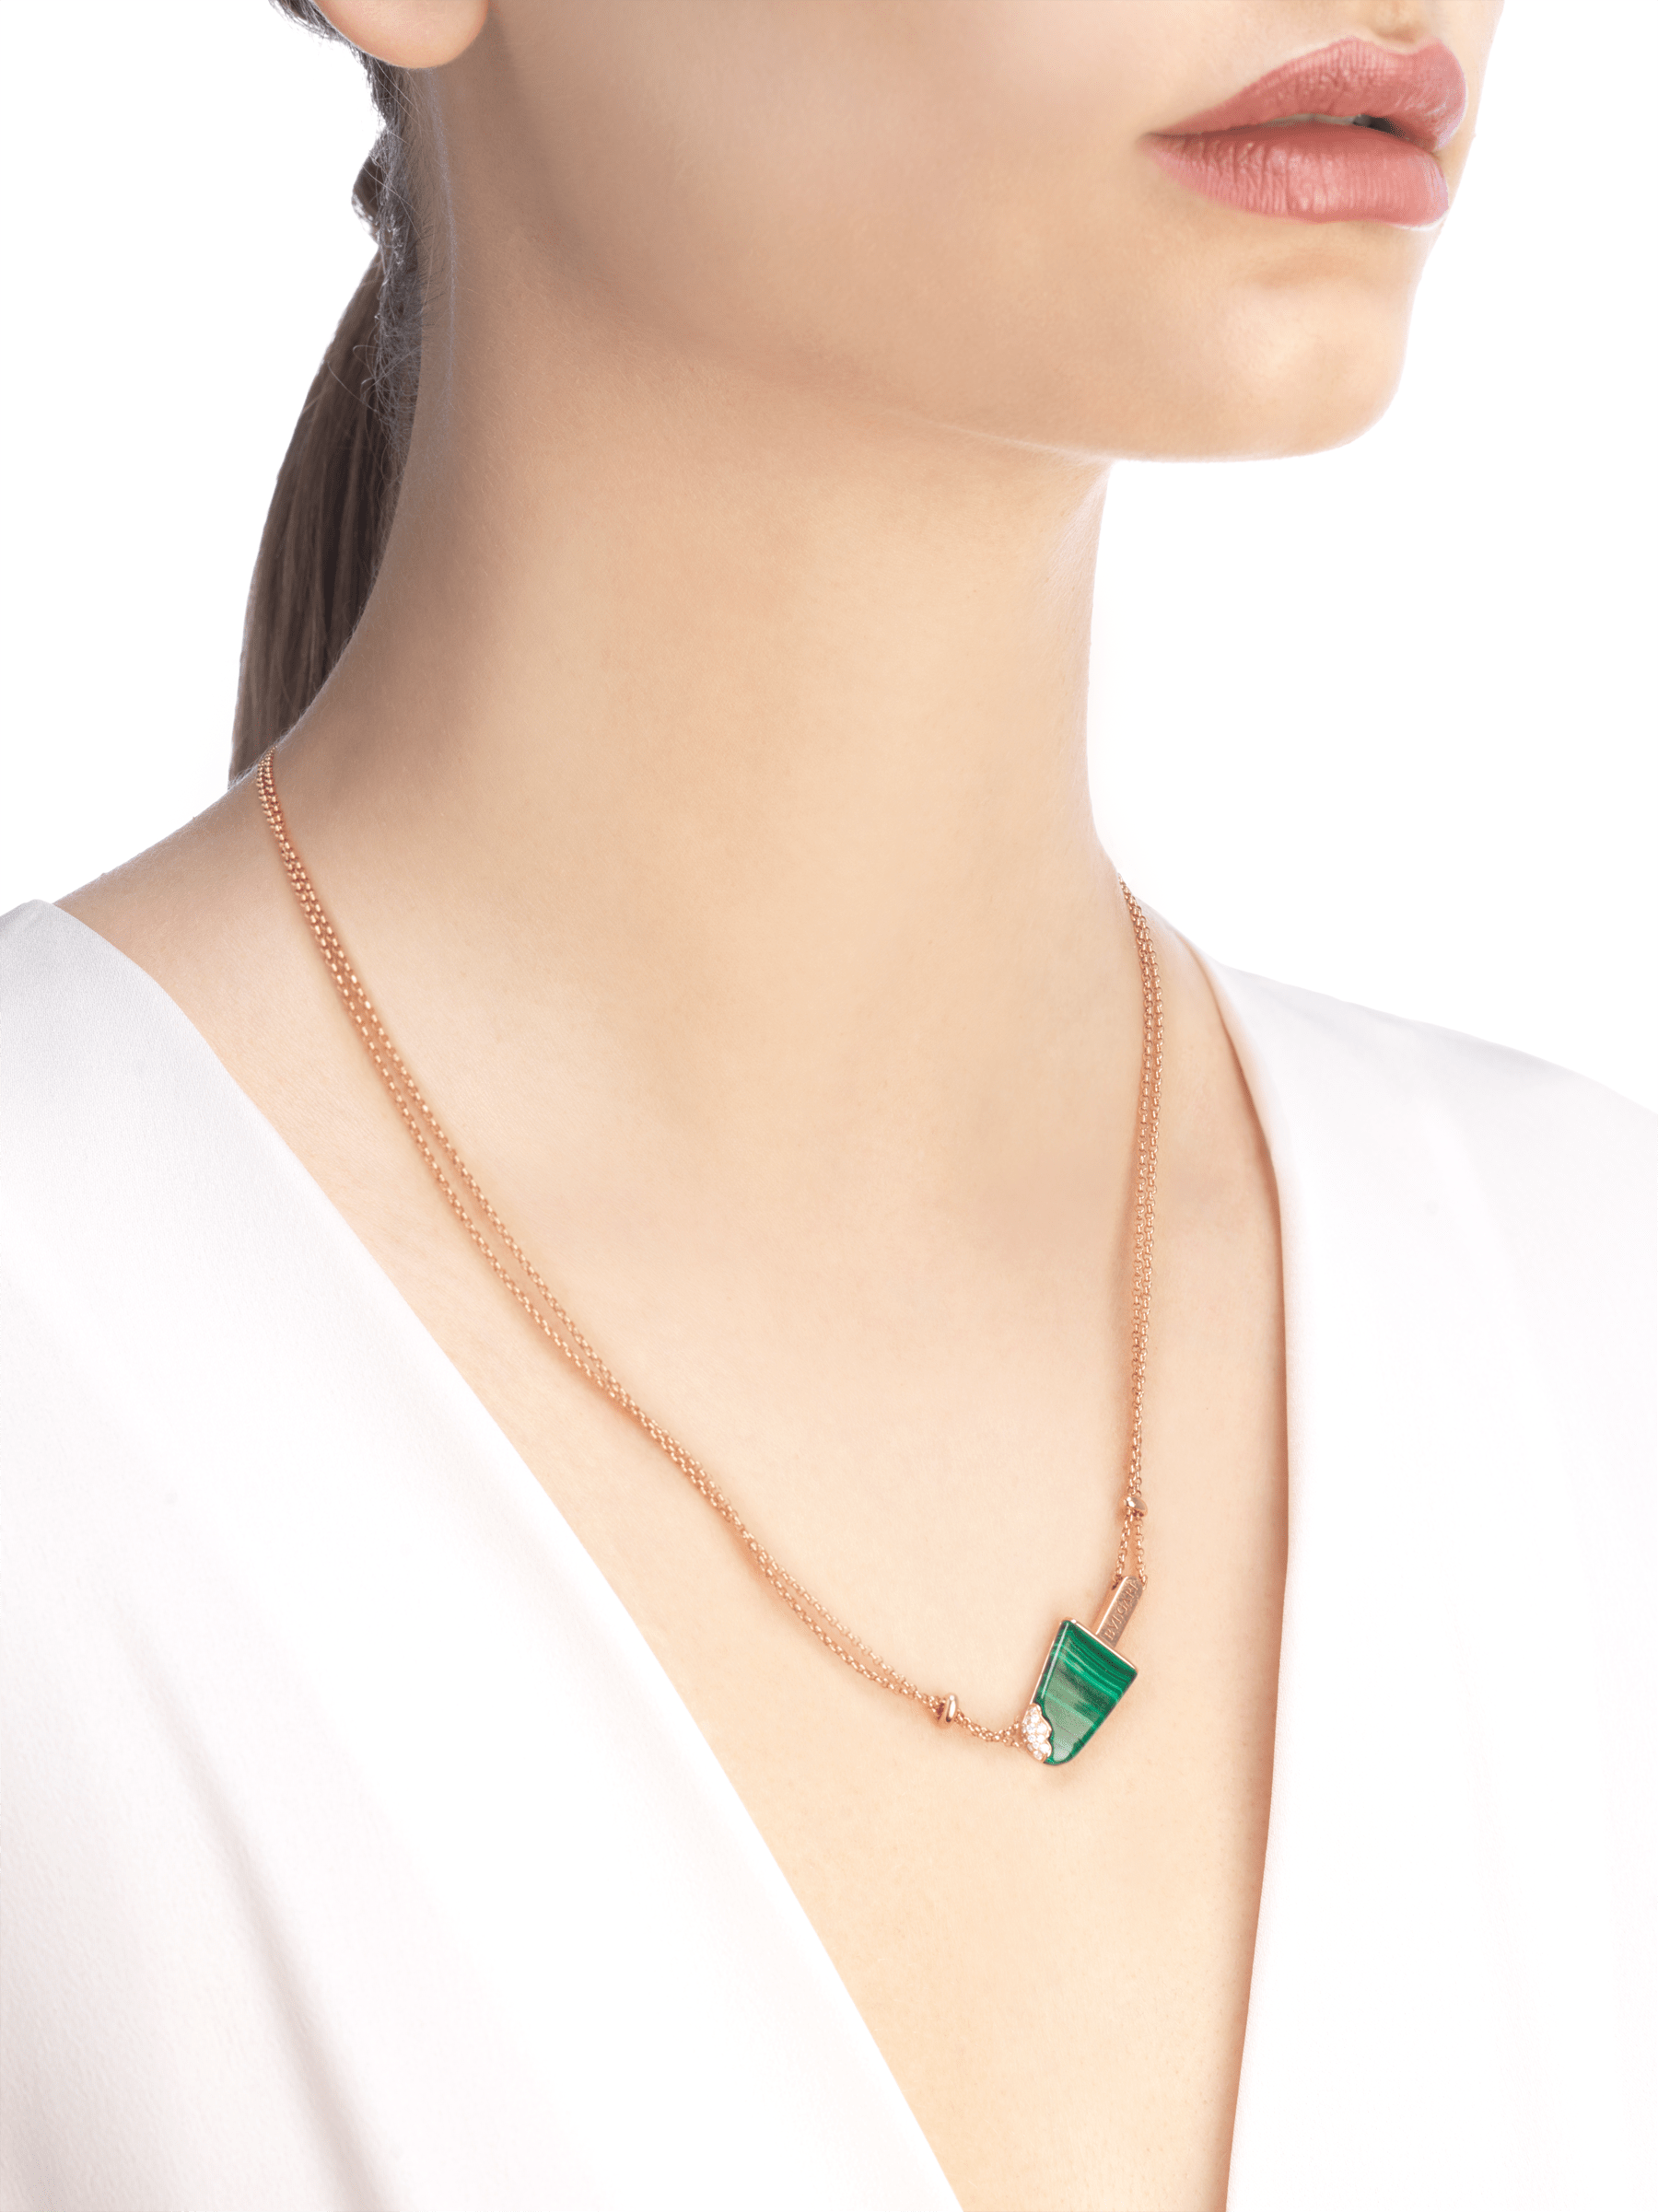 BVLGARI BVLGARI Gelati项链,18K玫瑰金材质,镶嵌孔雀石,饰以密镶钻石 356186 image 3